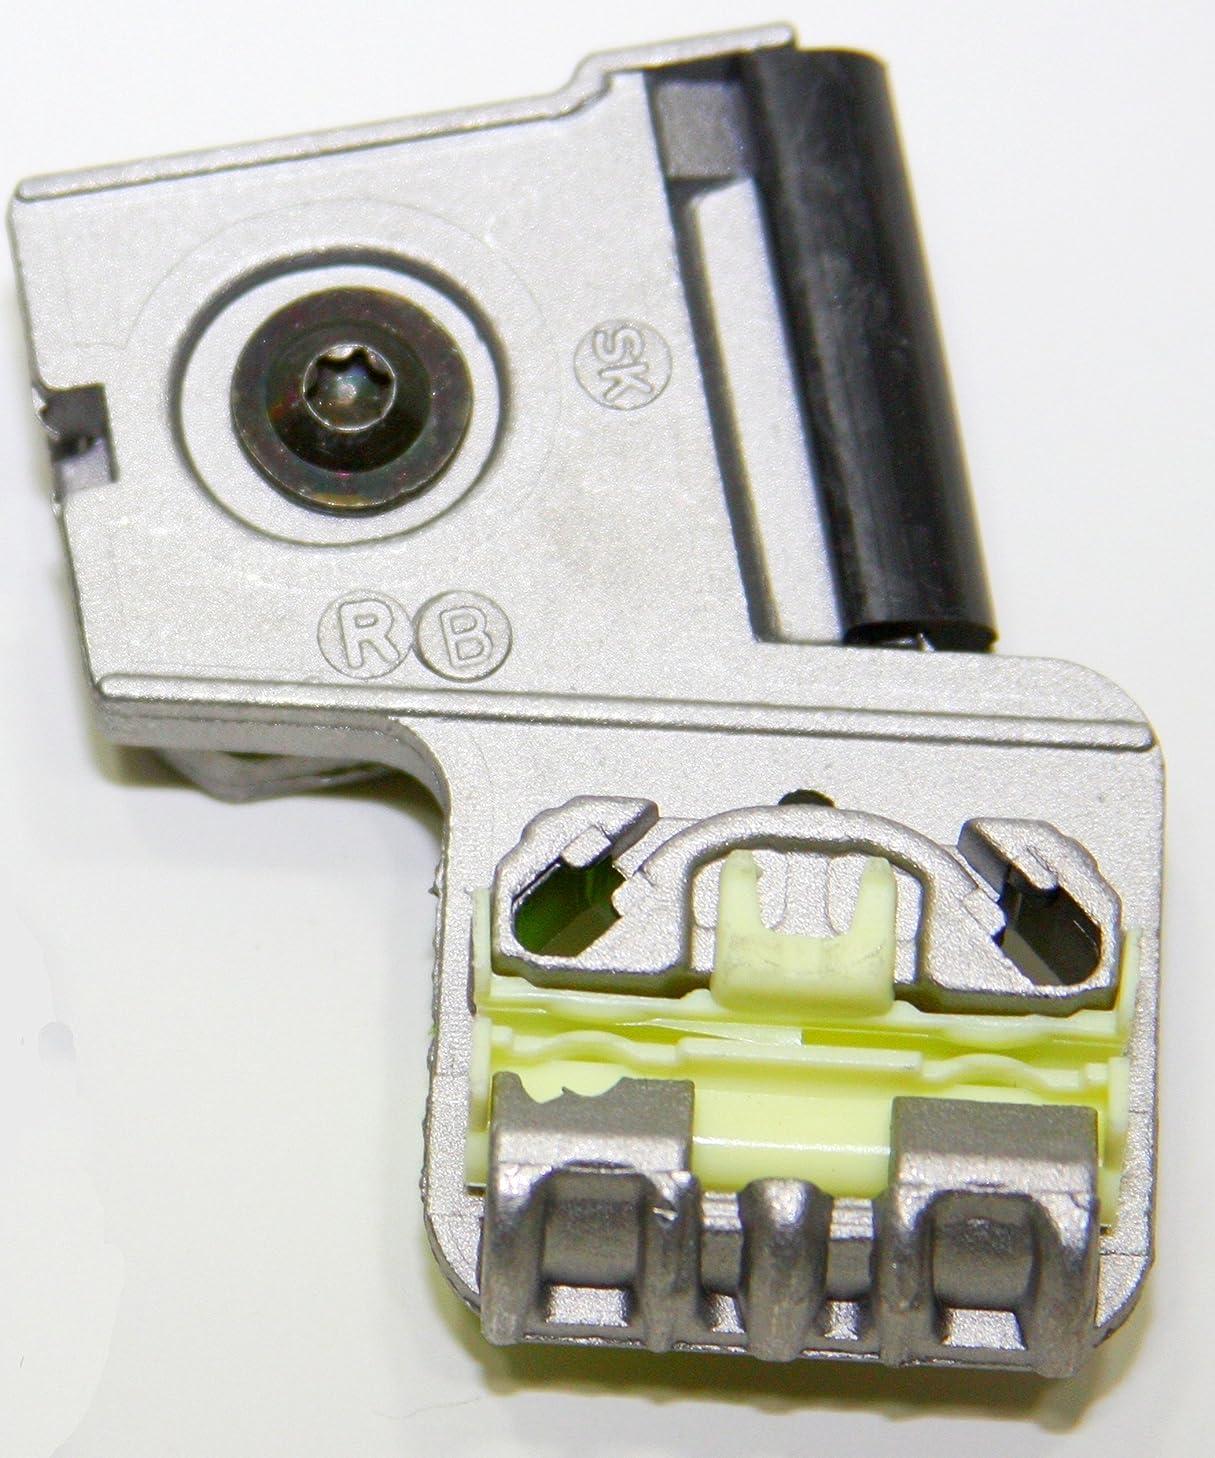 RegulatorFix Window Regulator Repair Clip and Bracket Holder - METAL - Front Right B for VW Golf 4 Jetta 4 (Bora) MK4